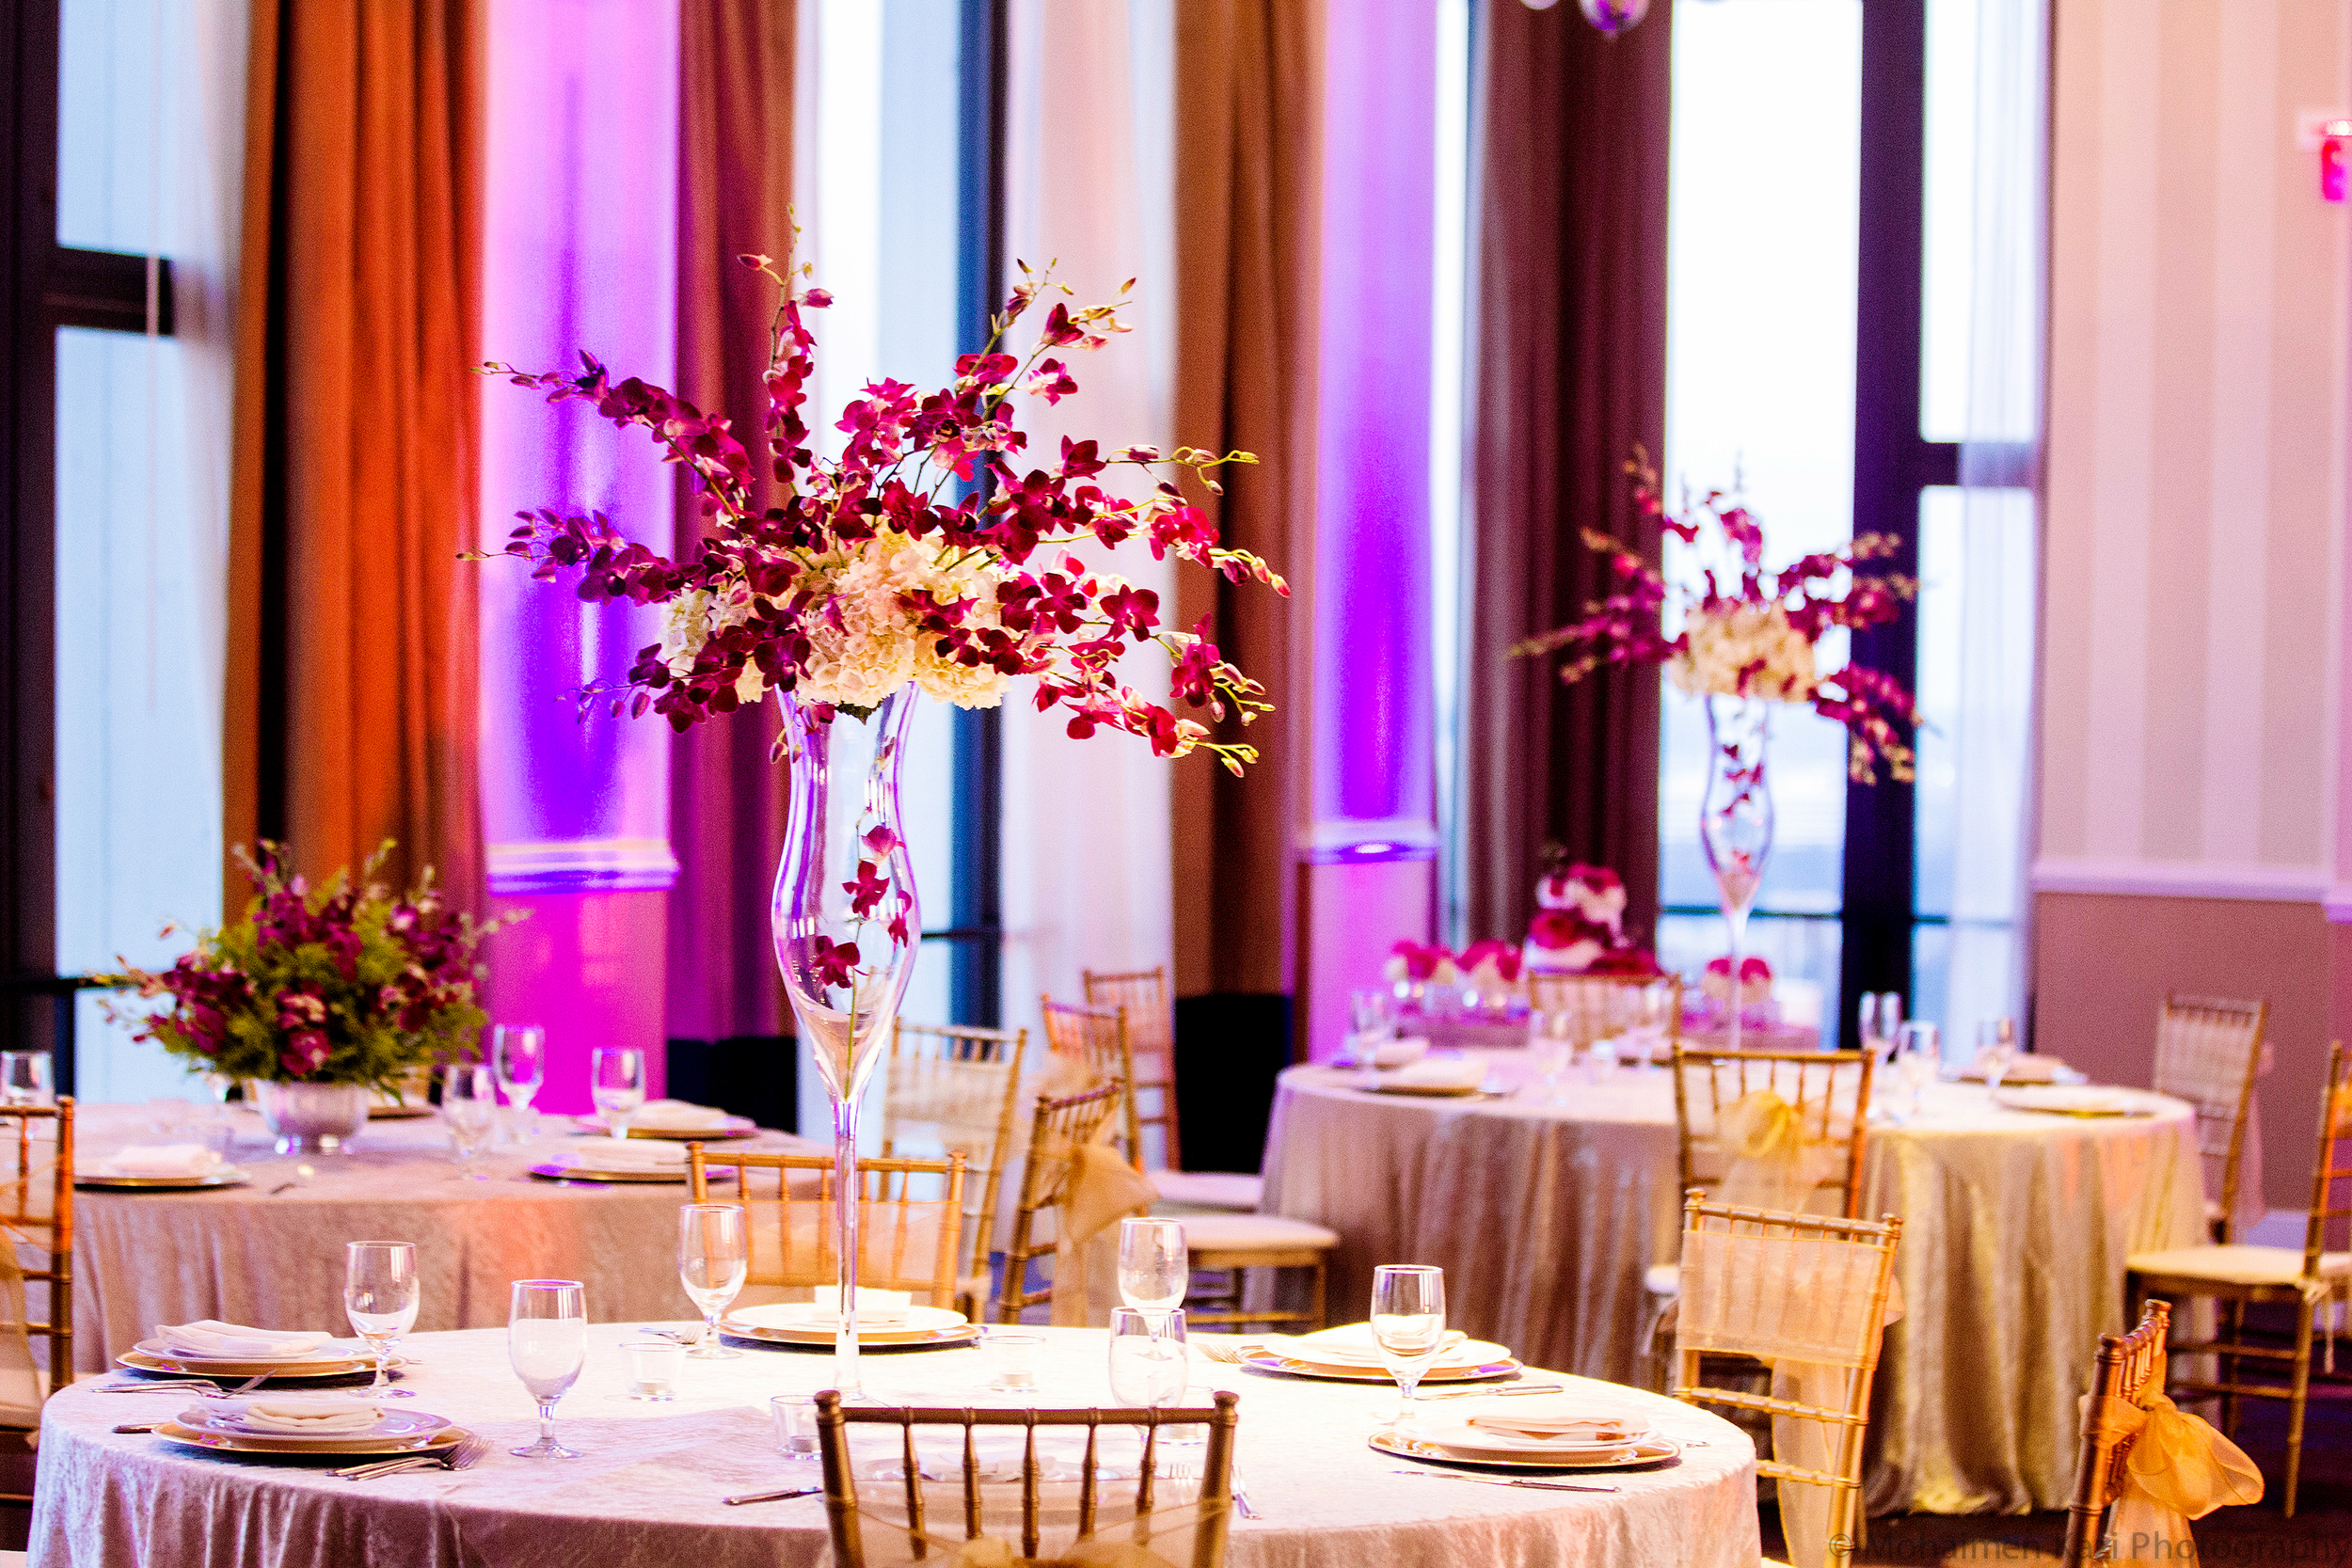 Purple Table Centerpieces